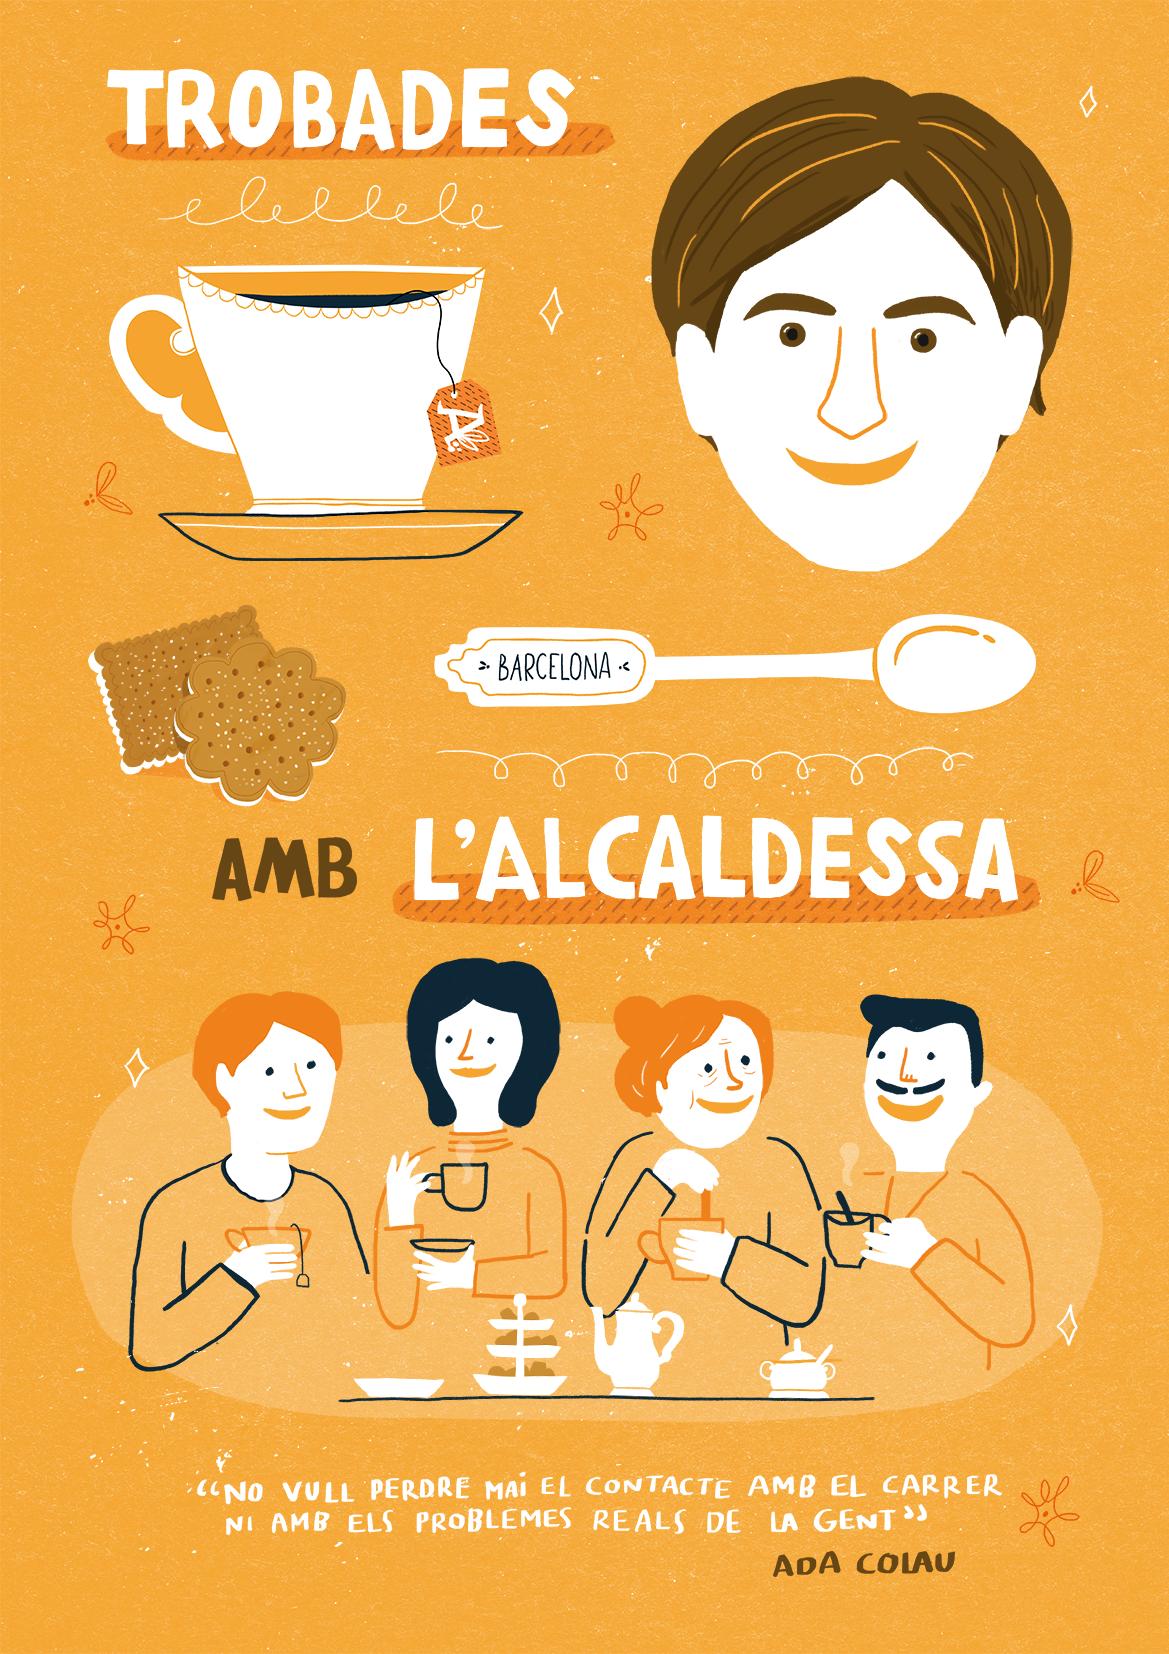 alcaldessa_adacolau_juliasolans_4